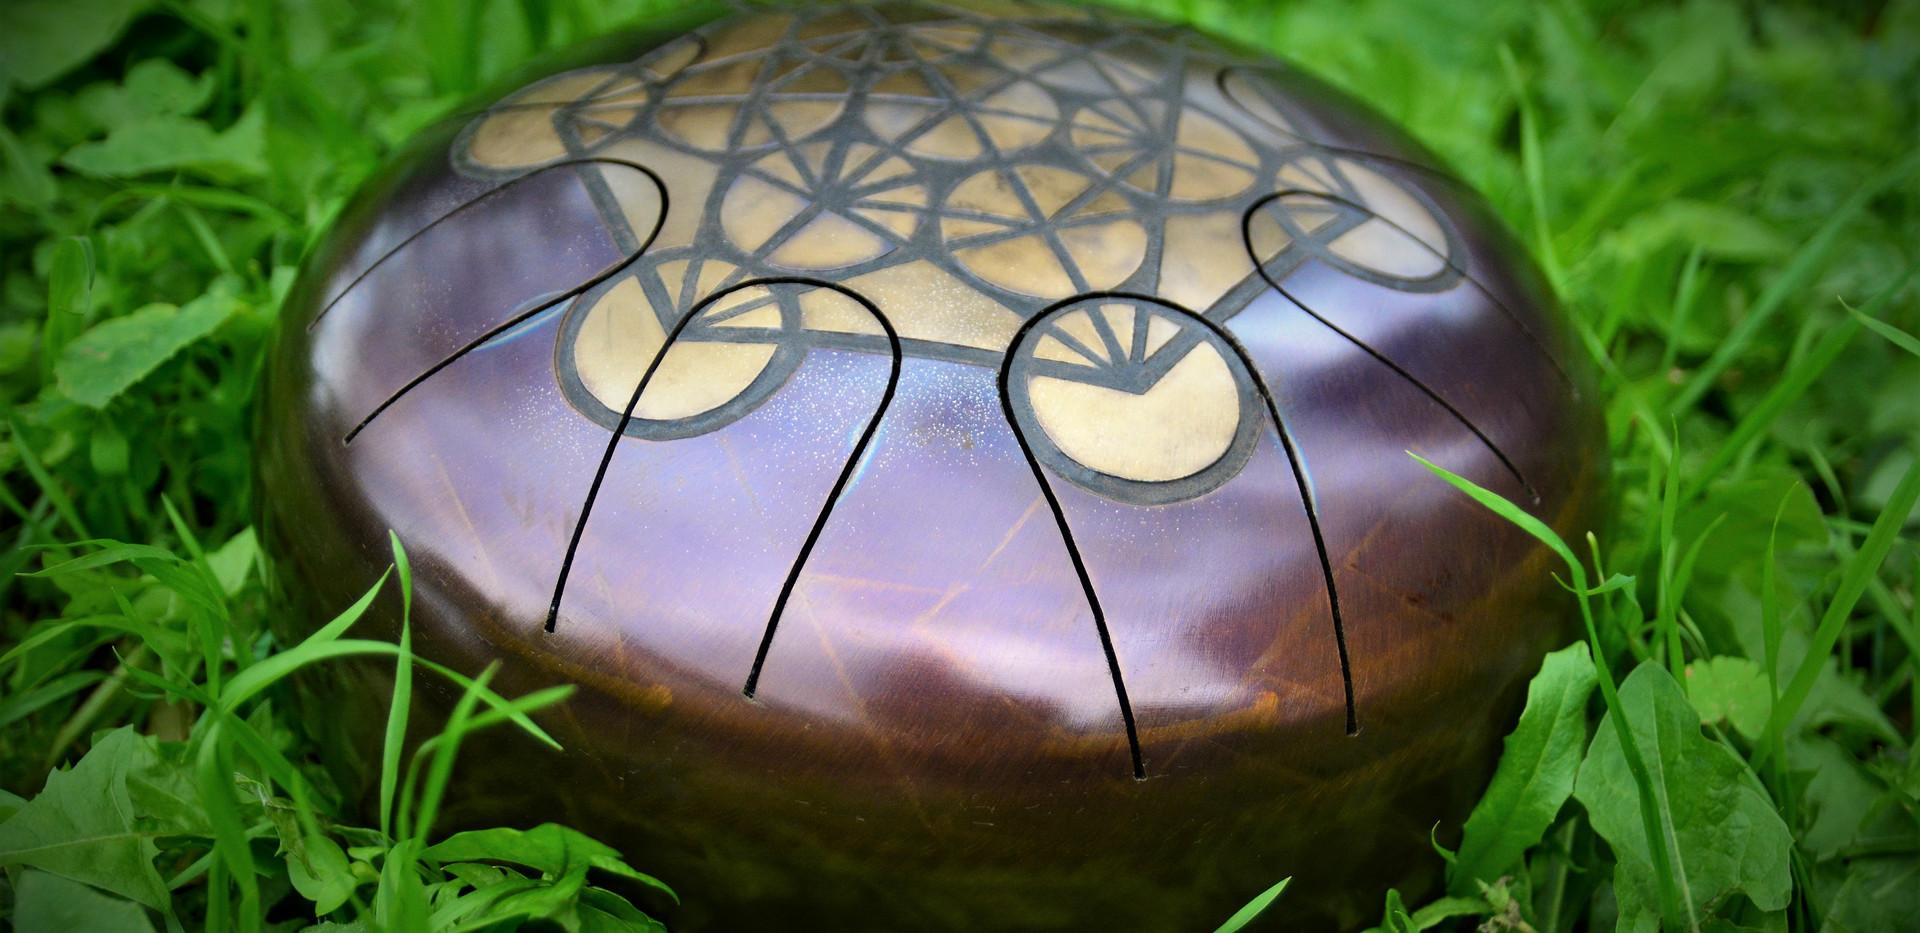 Dans l'herbe tankdrum - instrument de musique - hang - handpan - yoga